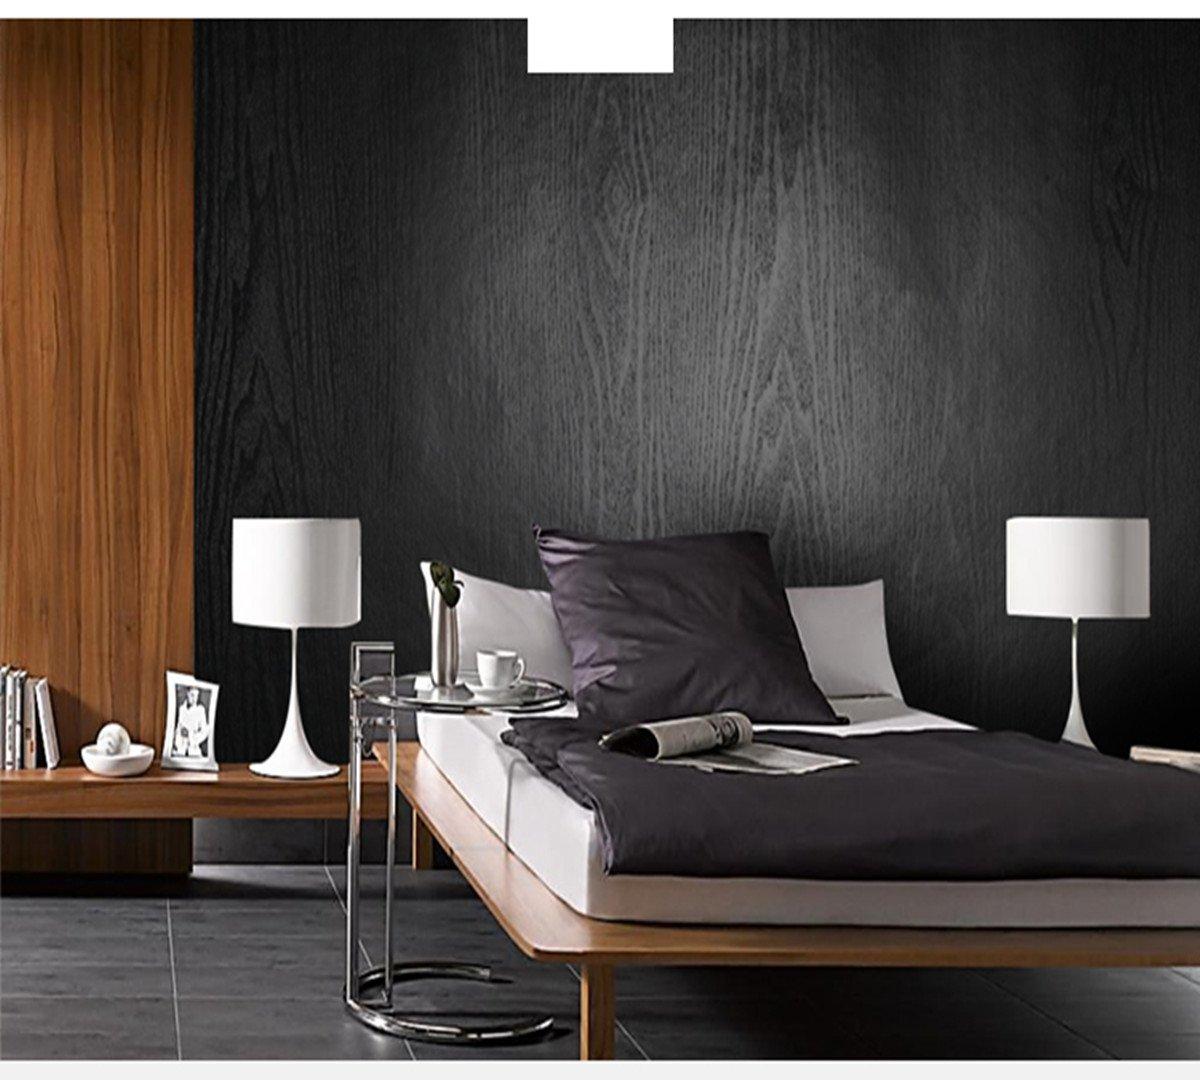 Hode Vinilo Autoadhesivo Madera Negro Mate con Textura 30 cm × 200 cm Papel Adhesivo para Muebles,Cocina,Film Adhesivo para Muebles